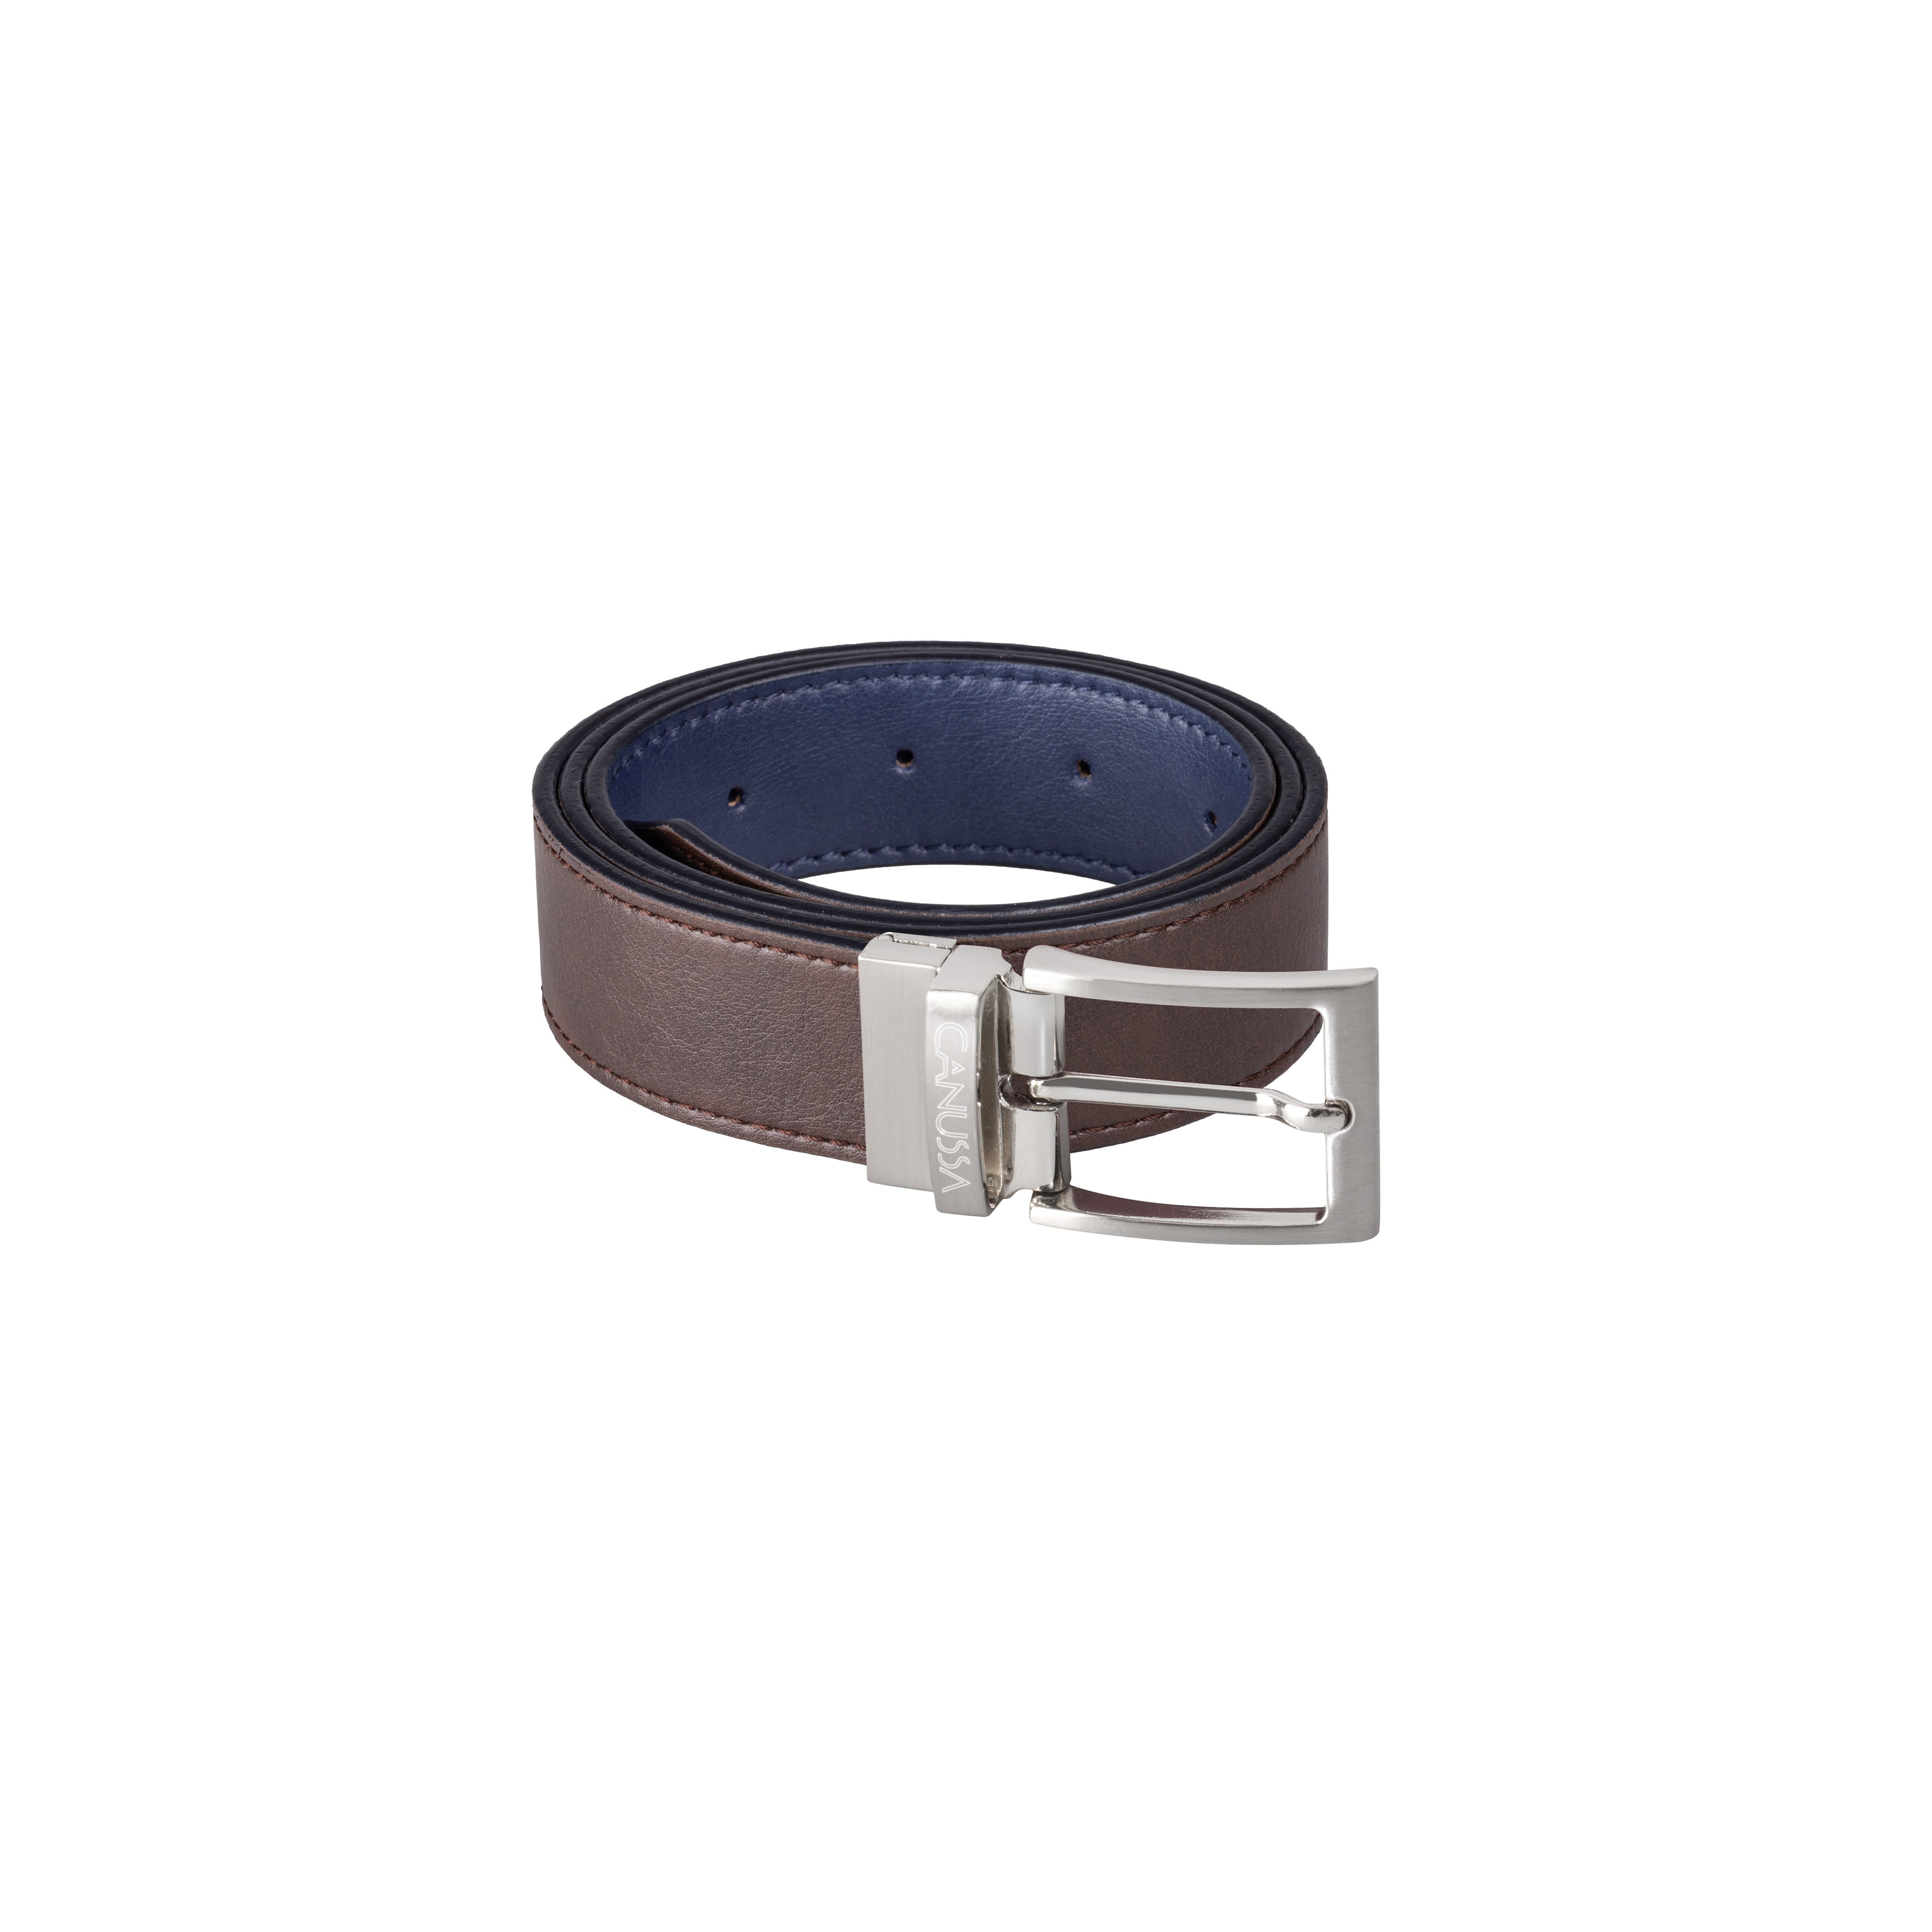 Canussa Reverse Vegan Belt – Reversible Blue/Brown